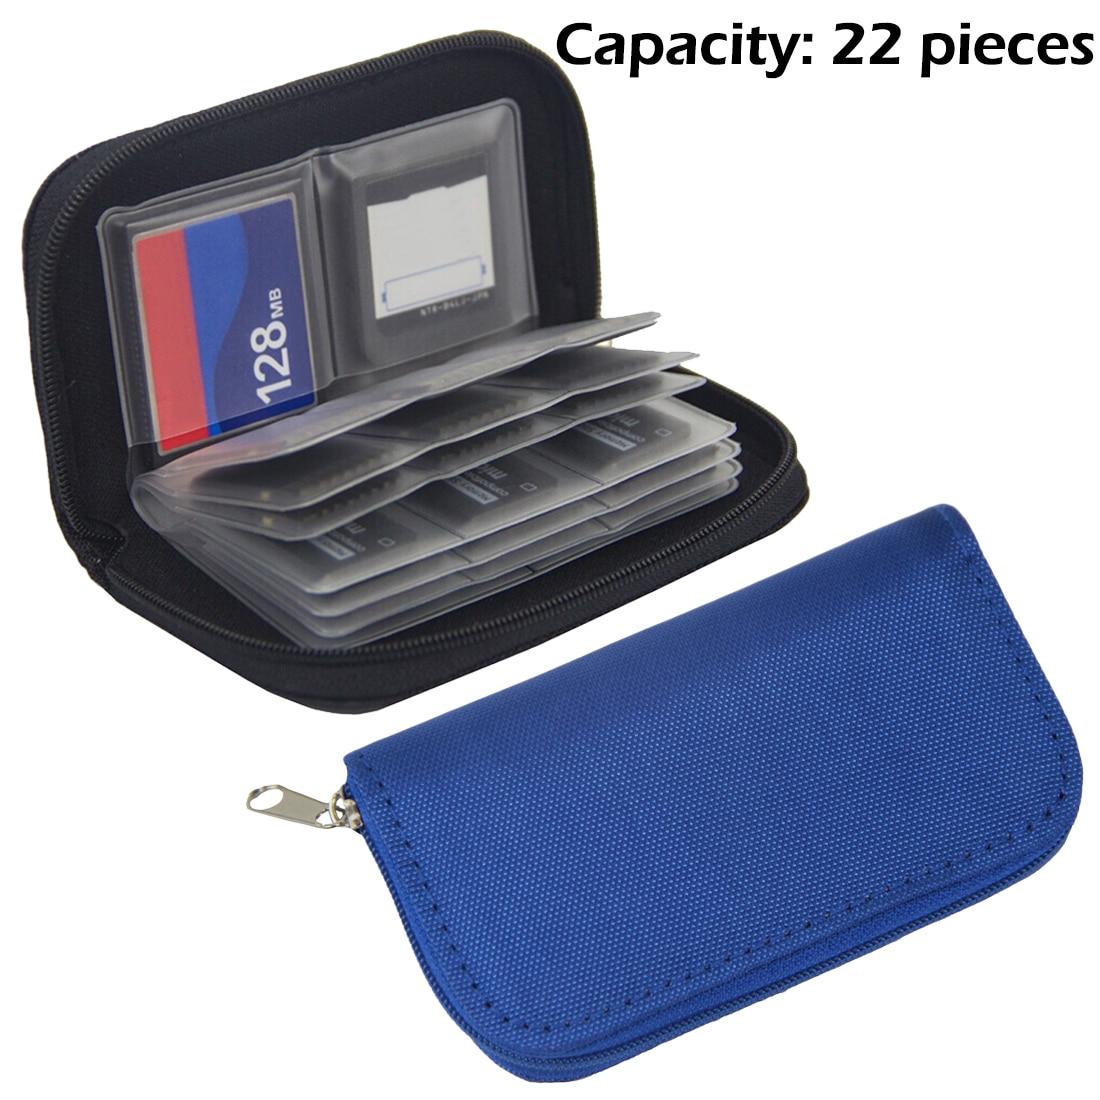 Portable Digital Camera SD SDHC MMC CF Micro SD Memory Card Storage Organization Wallet Case Bag 22 Slots CF Holder Blue